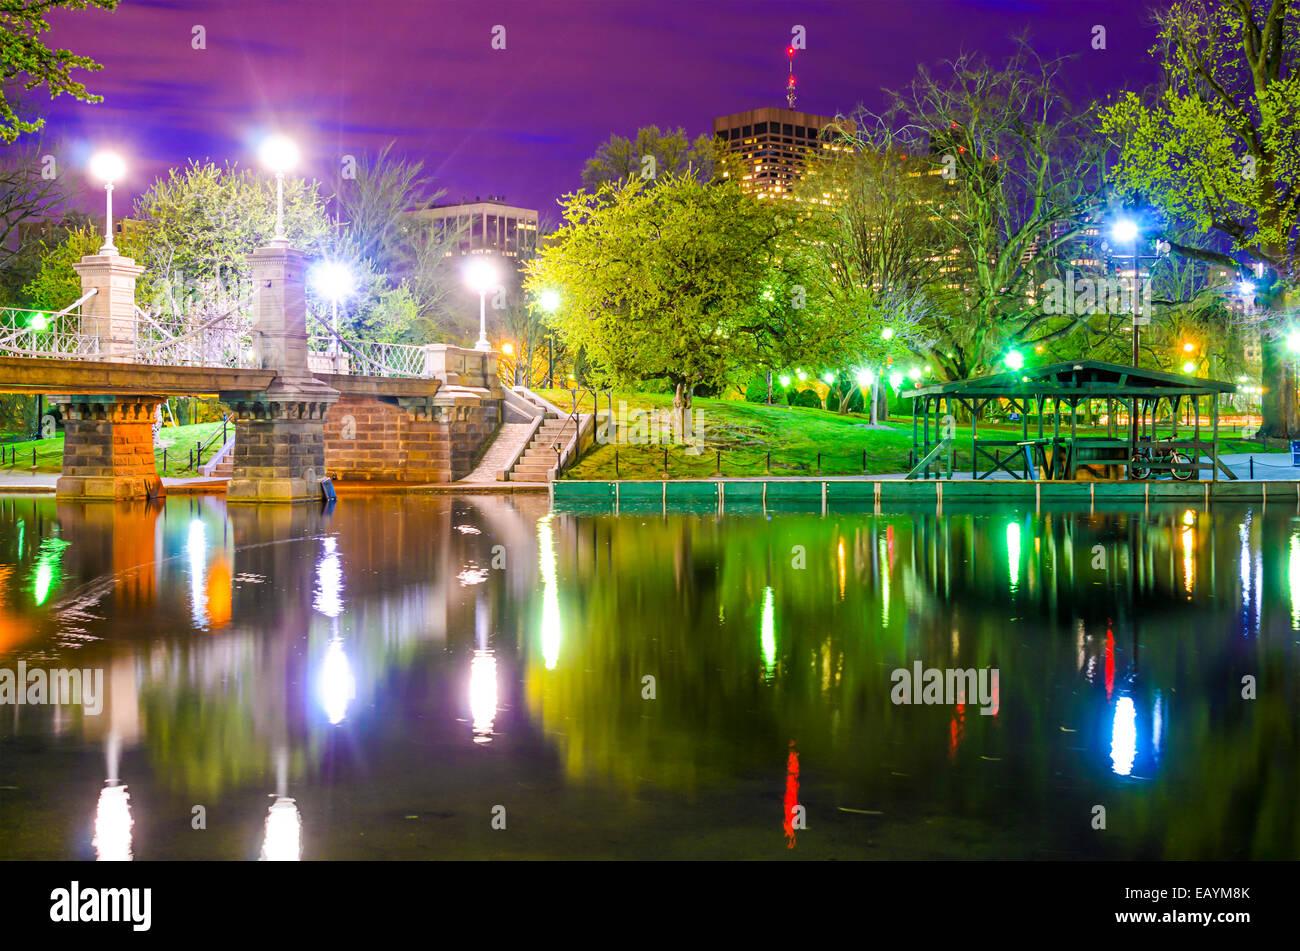 Lagoon Bridge and skyline of Boston, Massachusetts from the Boston Public Gardens. - Stock Image